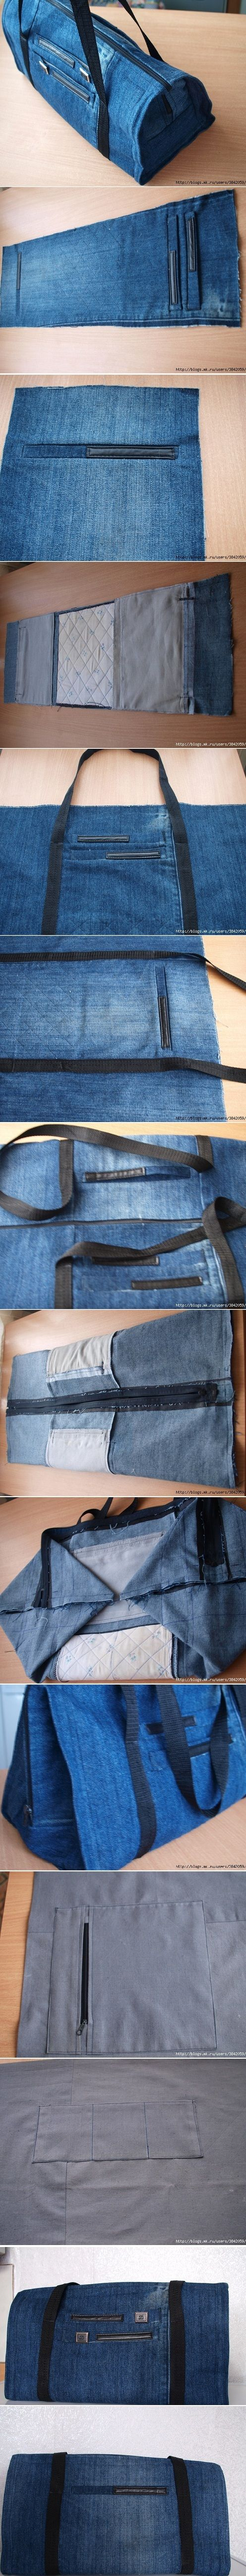 DIY Handbag Jeans